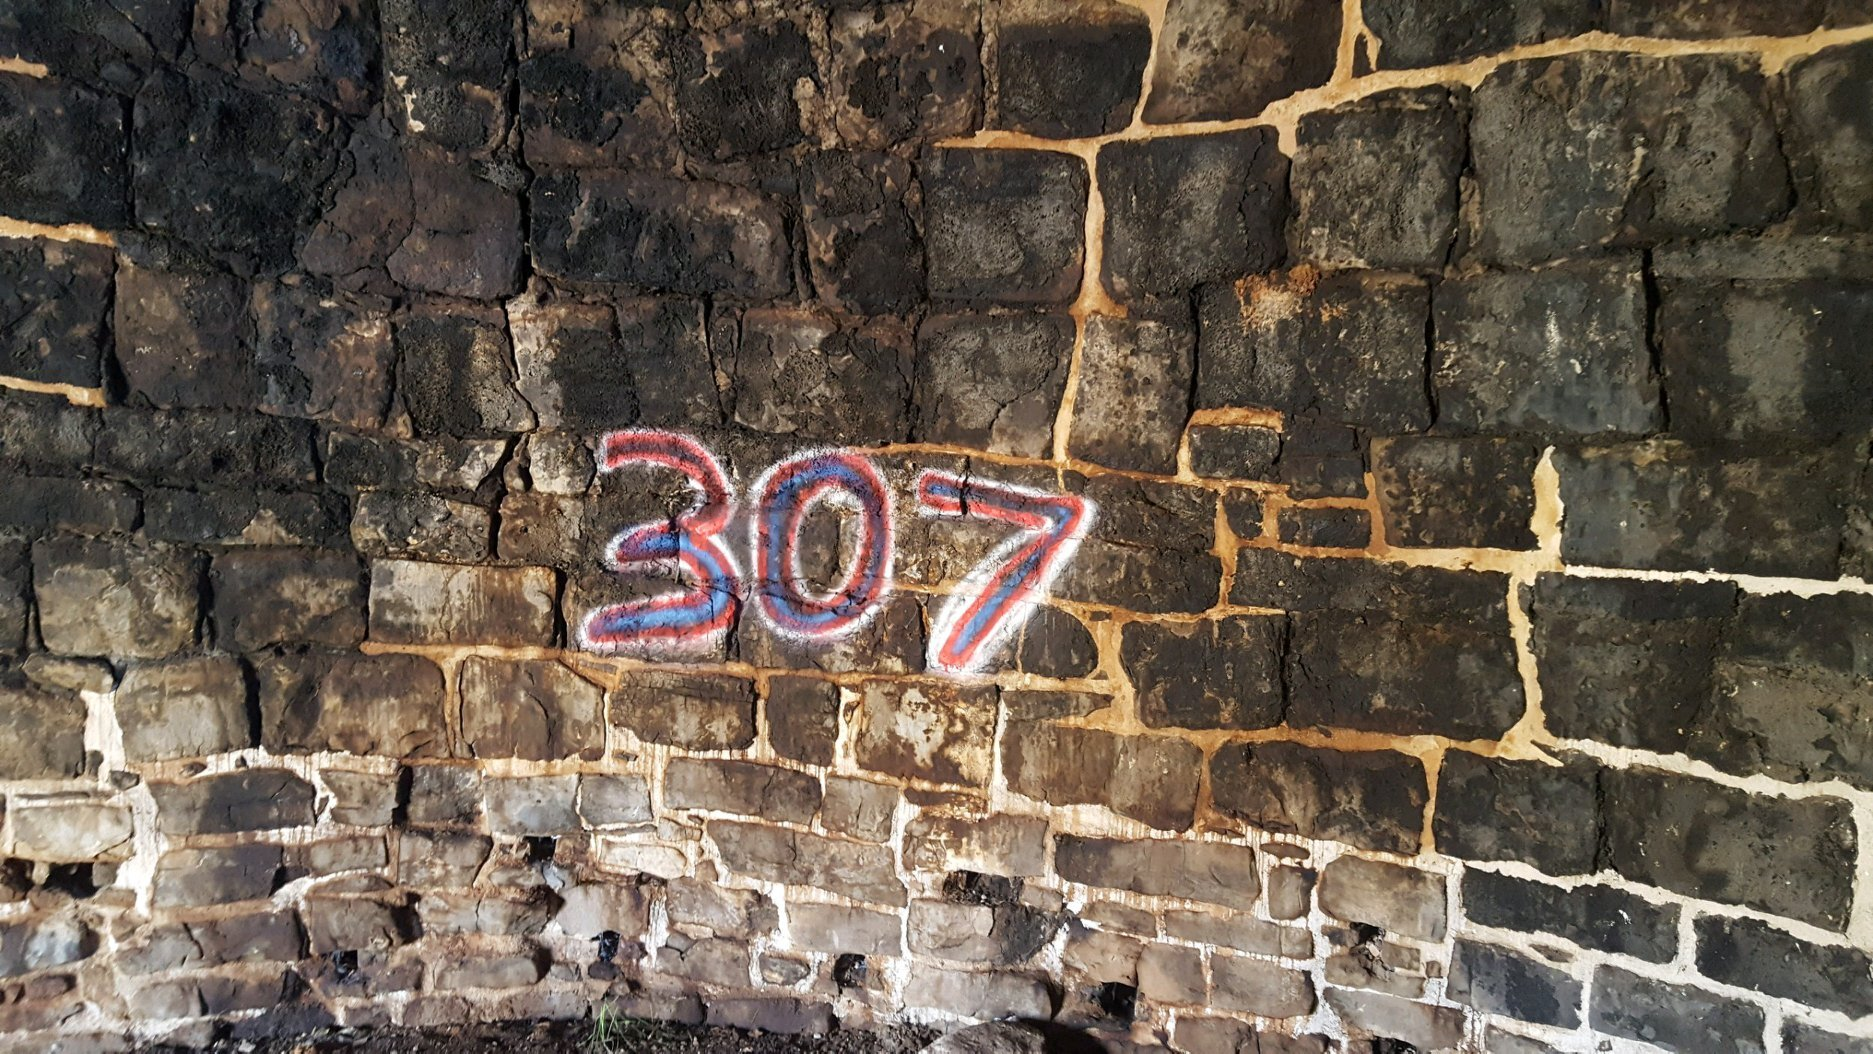 Photos: Uinta County Sheriff's Office investigating vandalism of PiedmontKilns